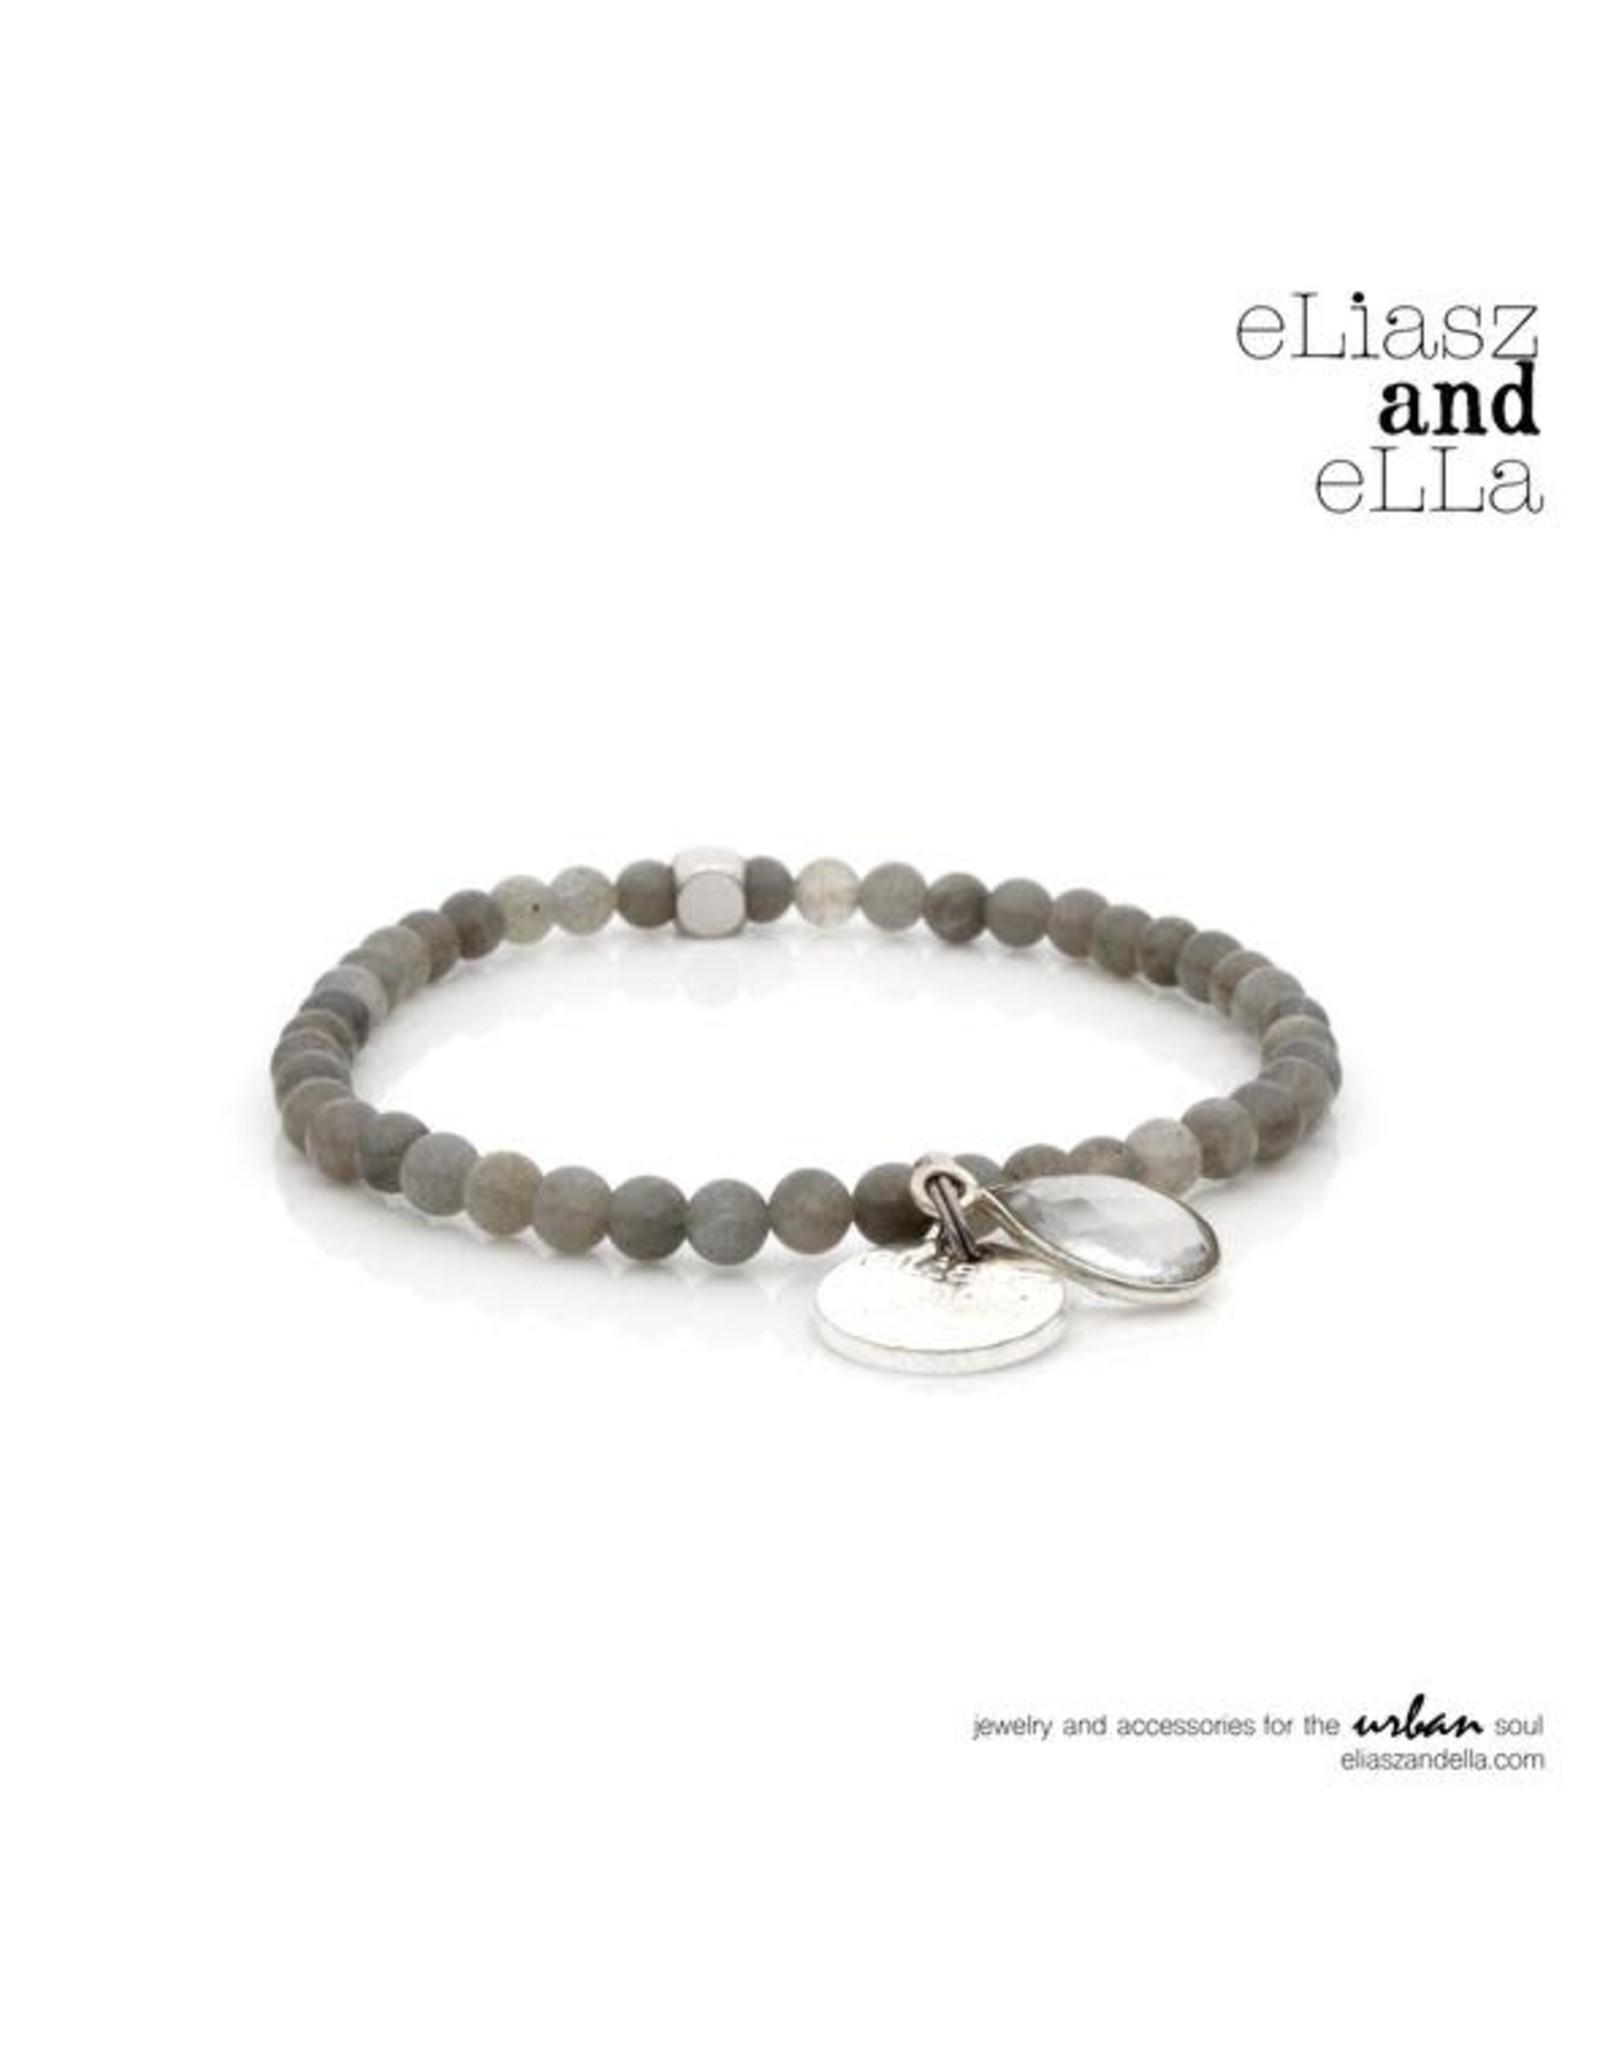 "eLiasz and eLLa ""LA-Bro"" Stone Bangin' Bracelet"